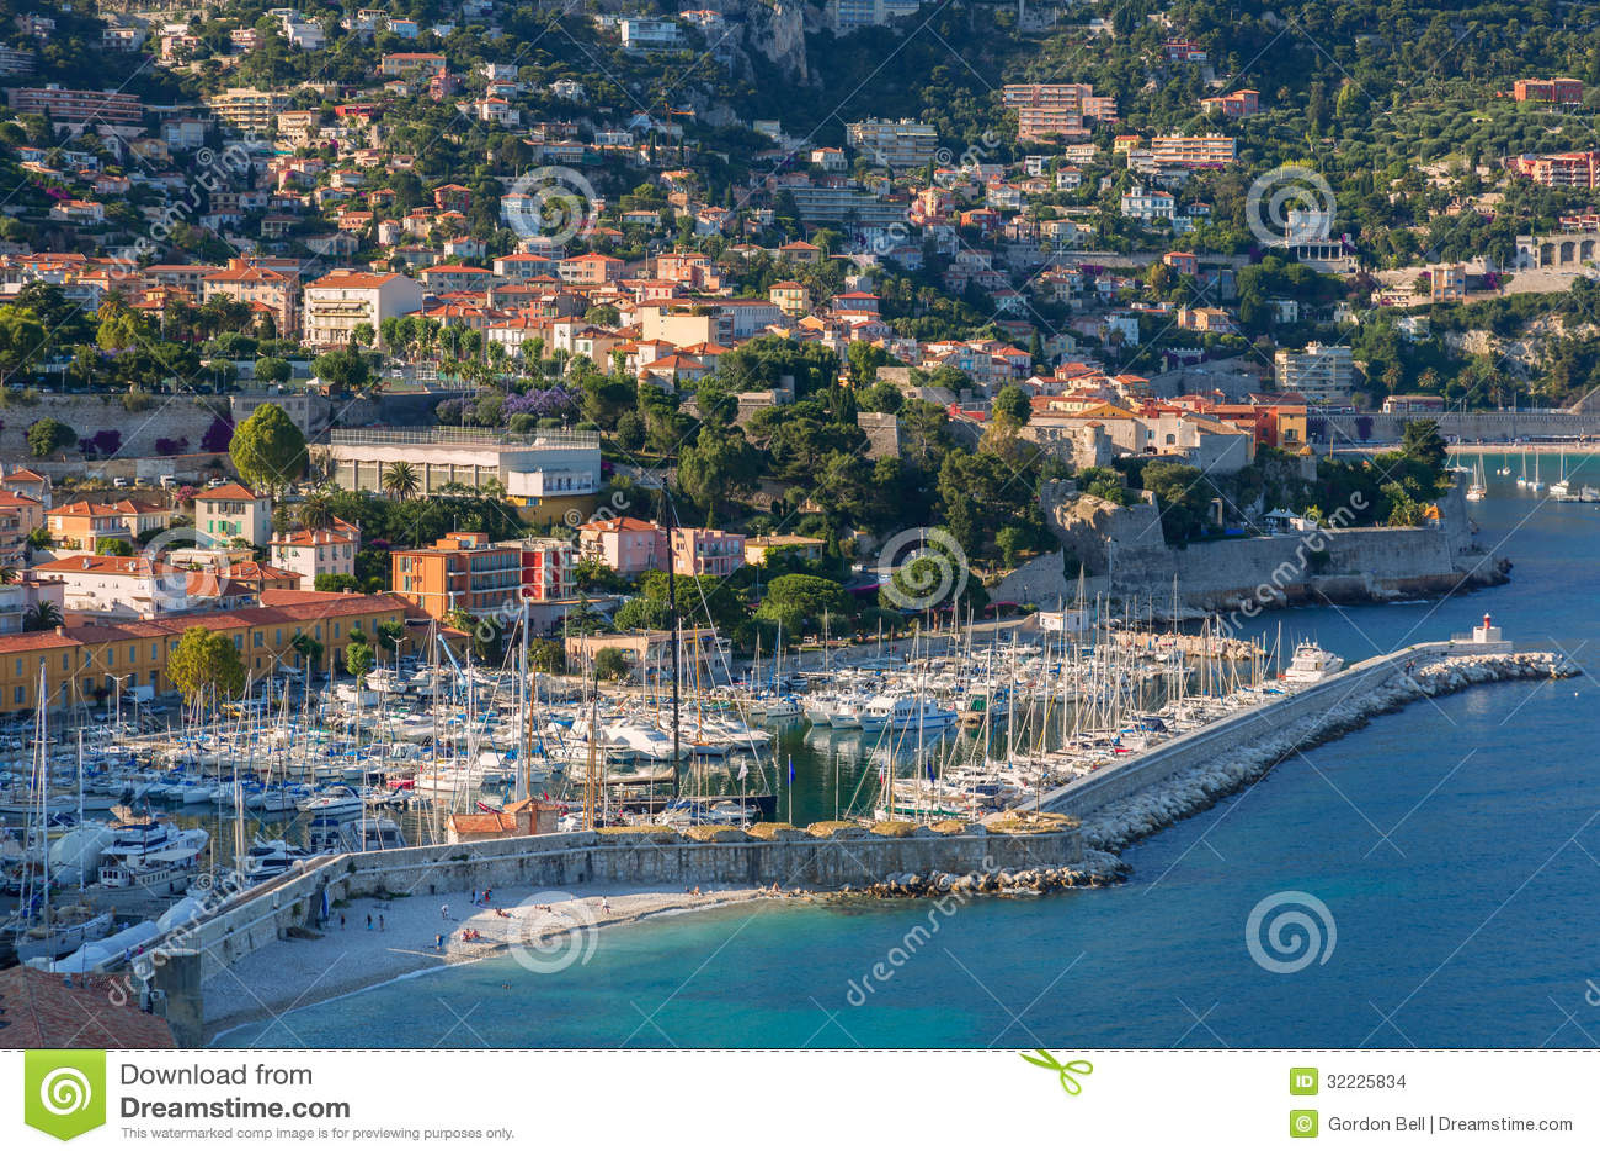 Download Villefranche-sur-Mer foto de stock. Imagem de baía, europa - 32225834